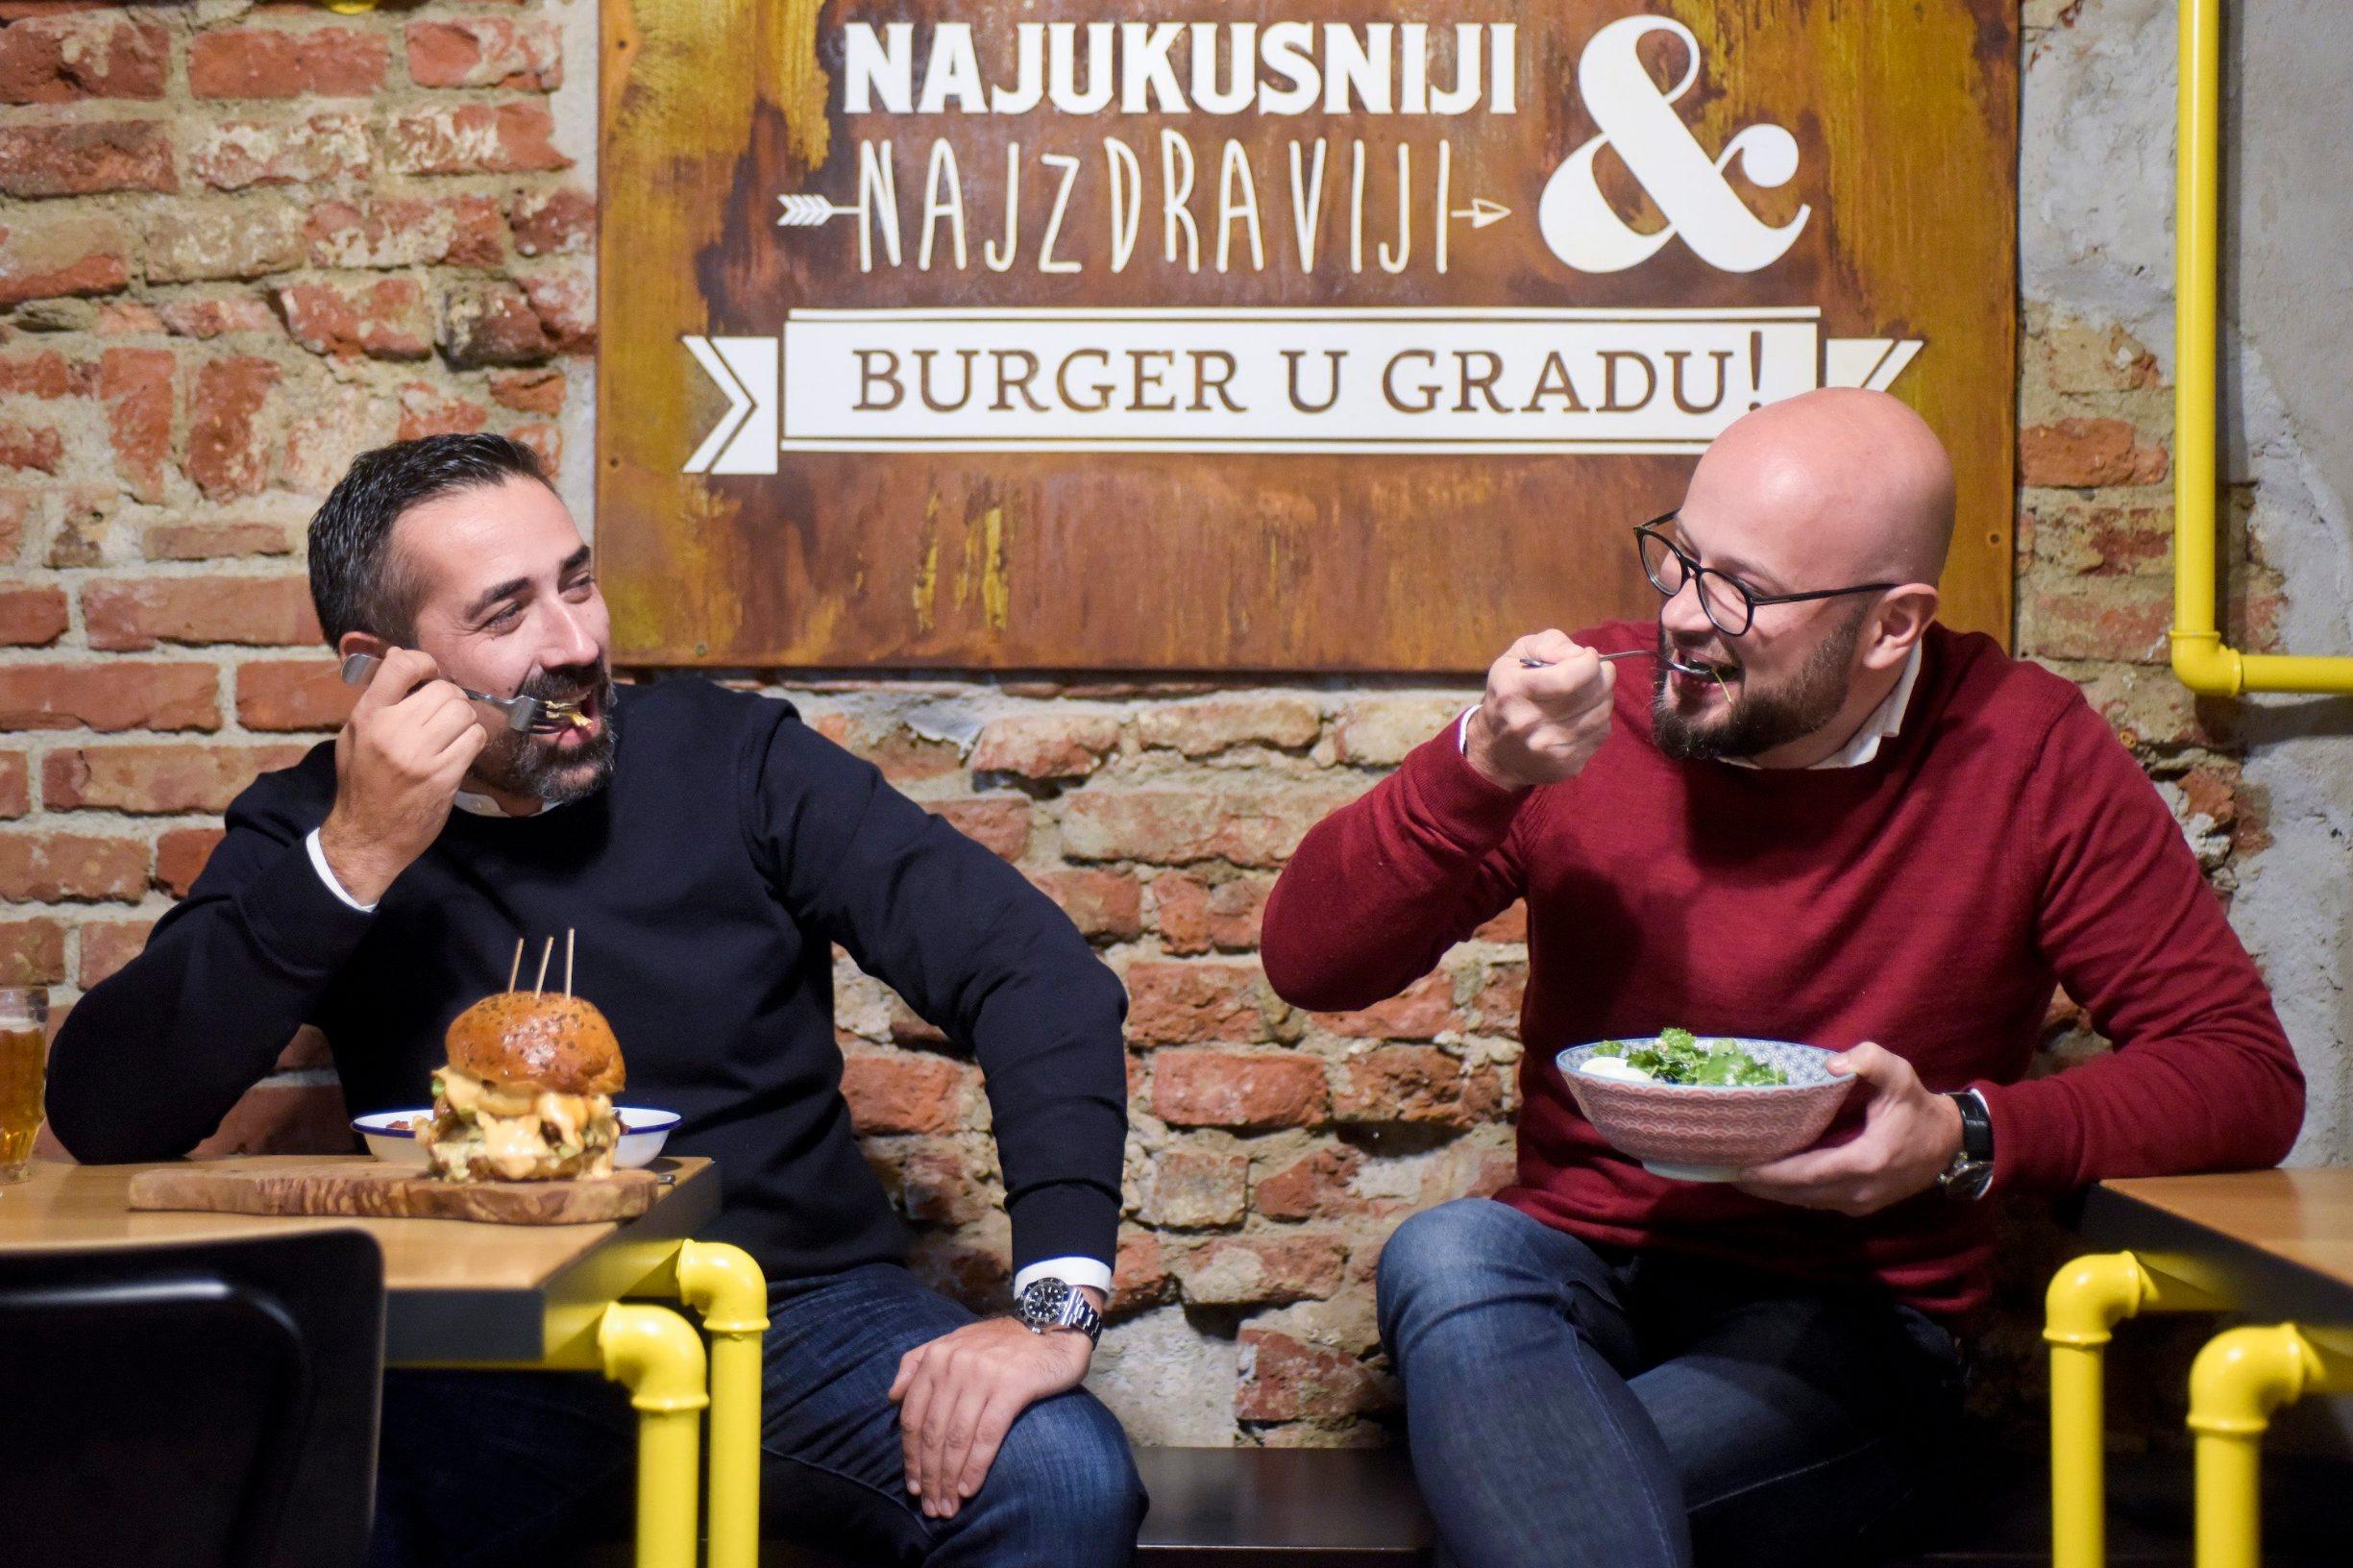 Zagreb, 311019. Tkalciceva 12. Submarine natural burgers, restoran brze hrane. Na fotografiji: Dragoljub Bozovic i Luka Juresko. Foto: Darko Tomas / CROPIX